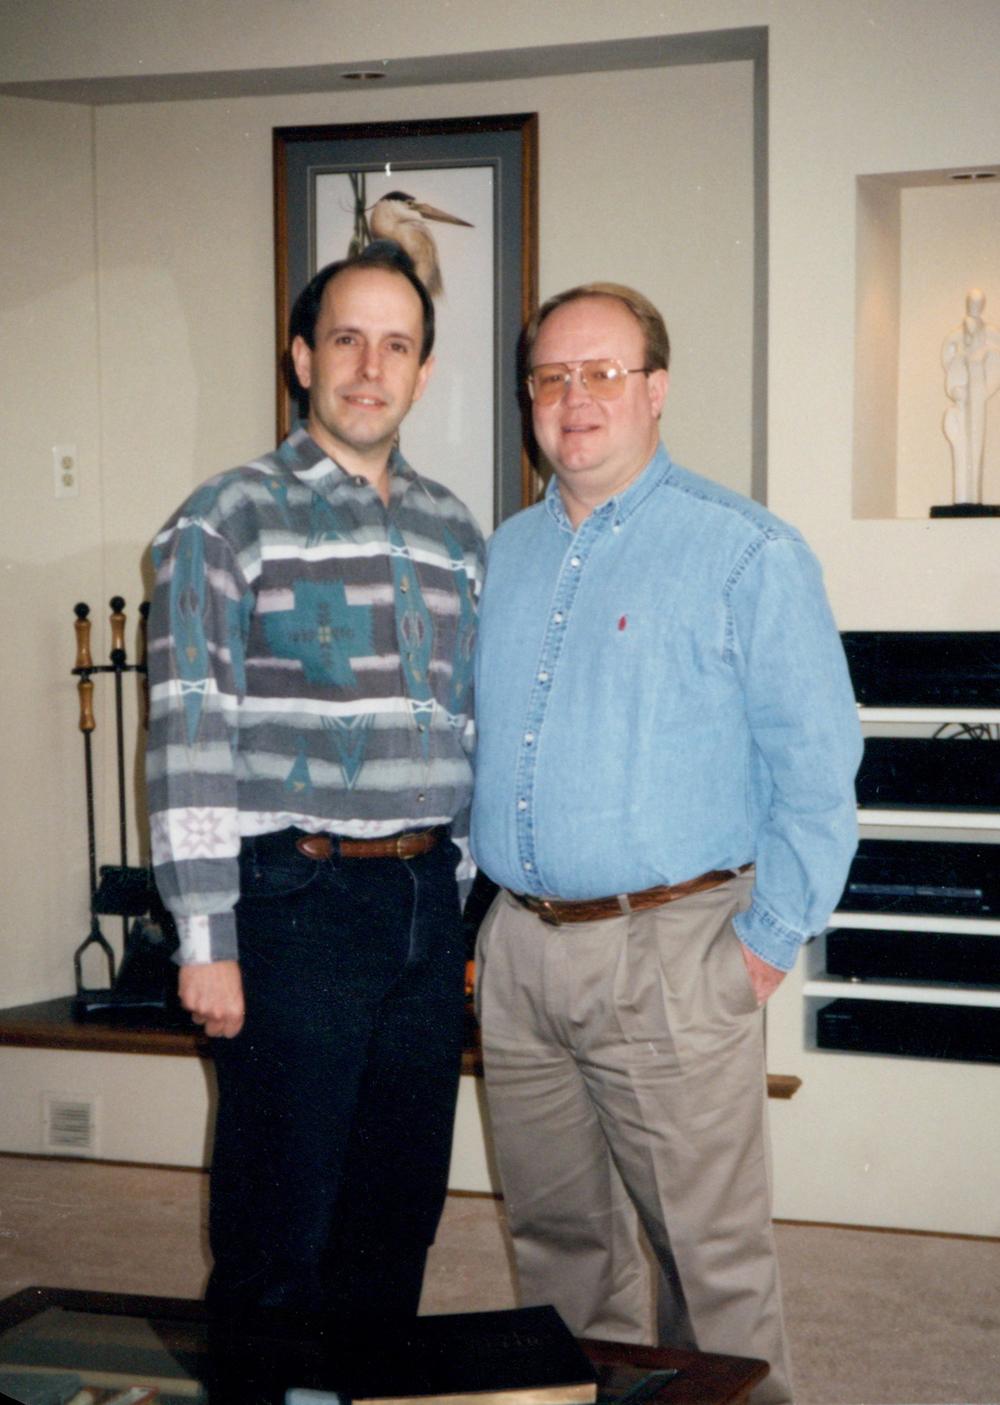 Don & Steve Smith, St. Louis MO